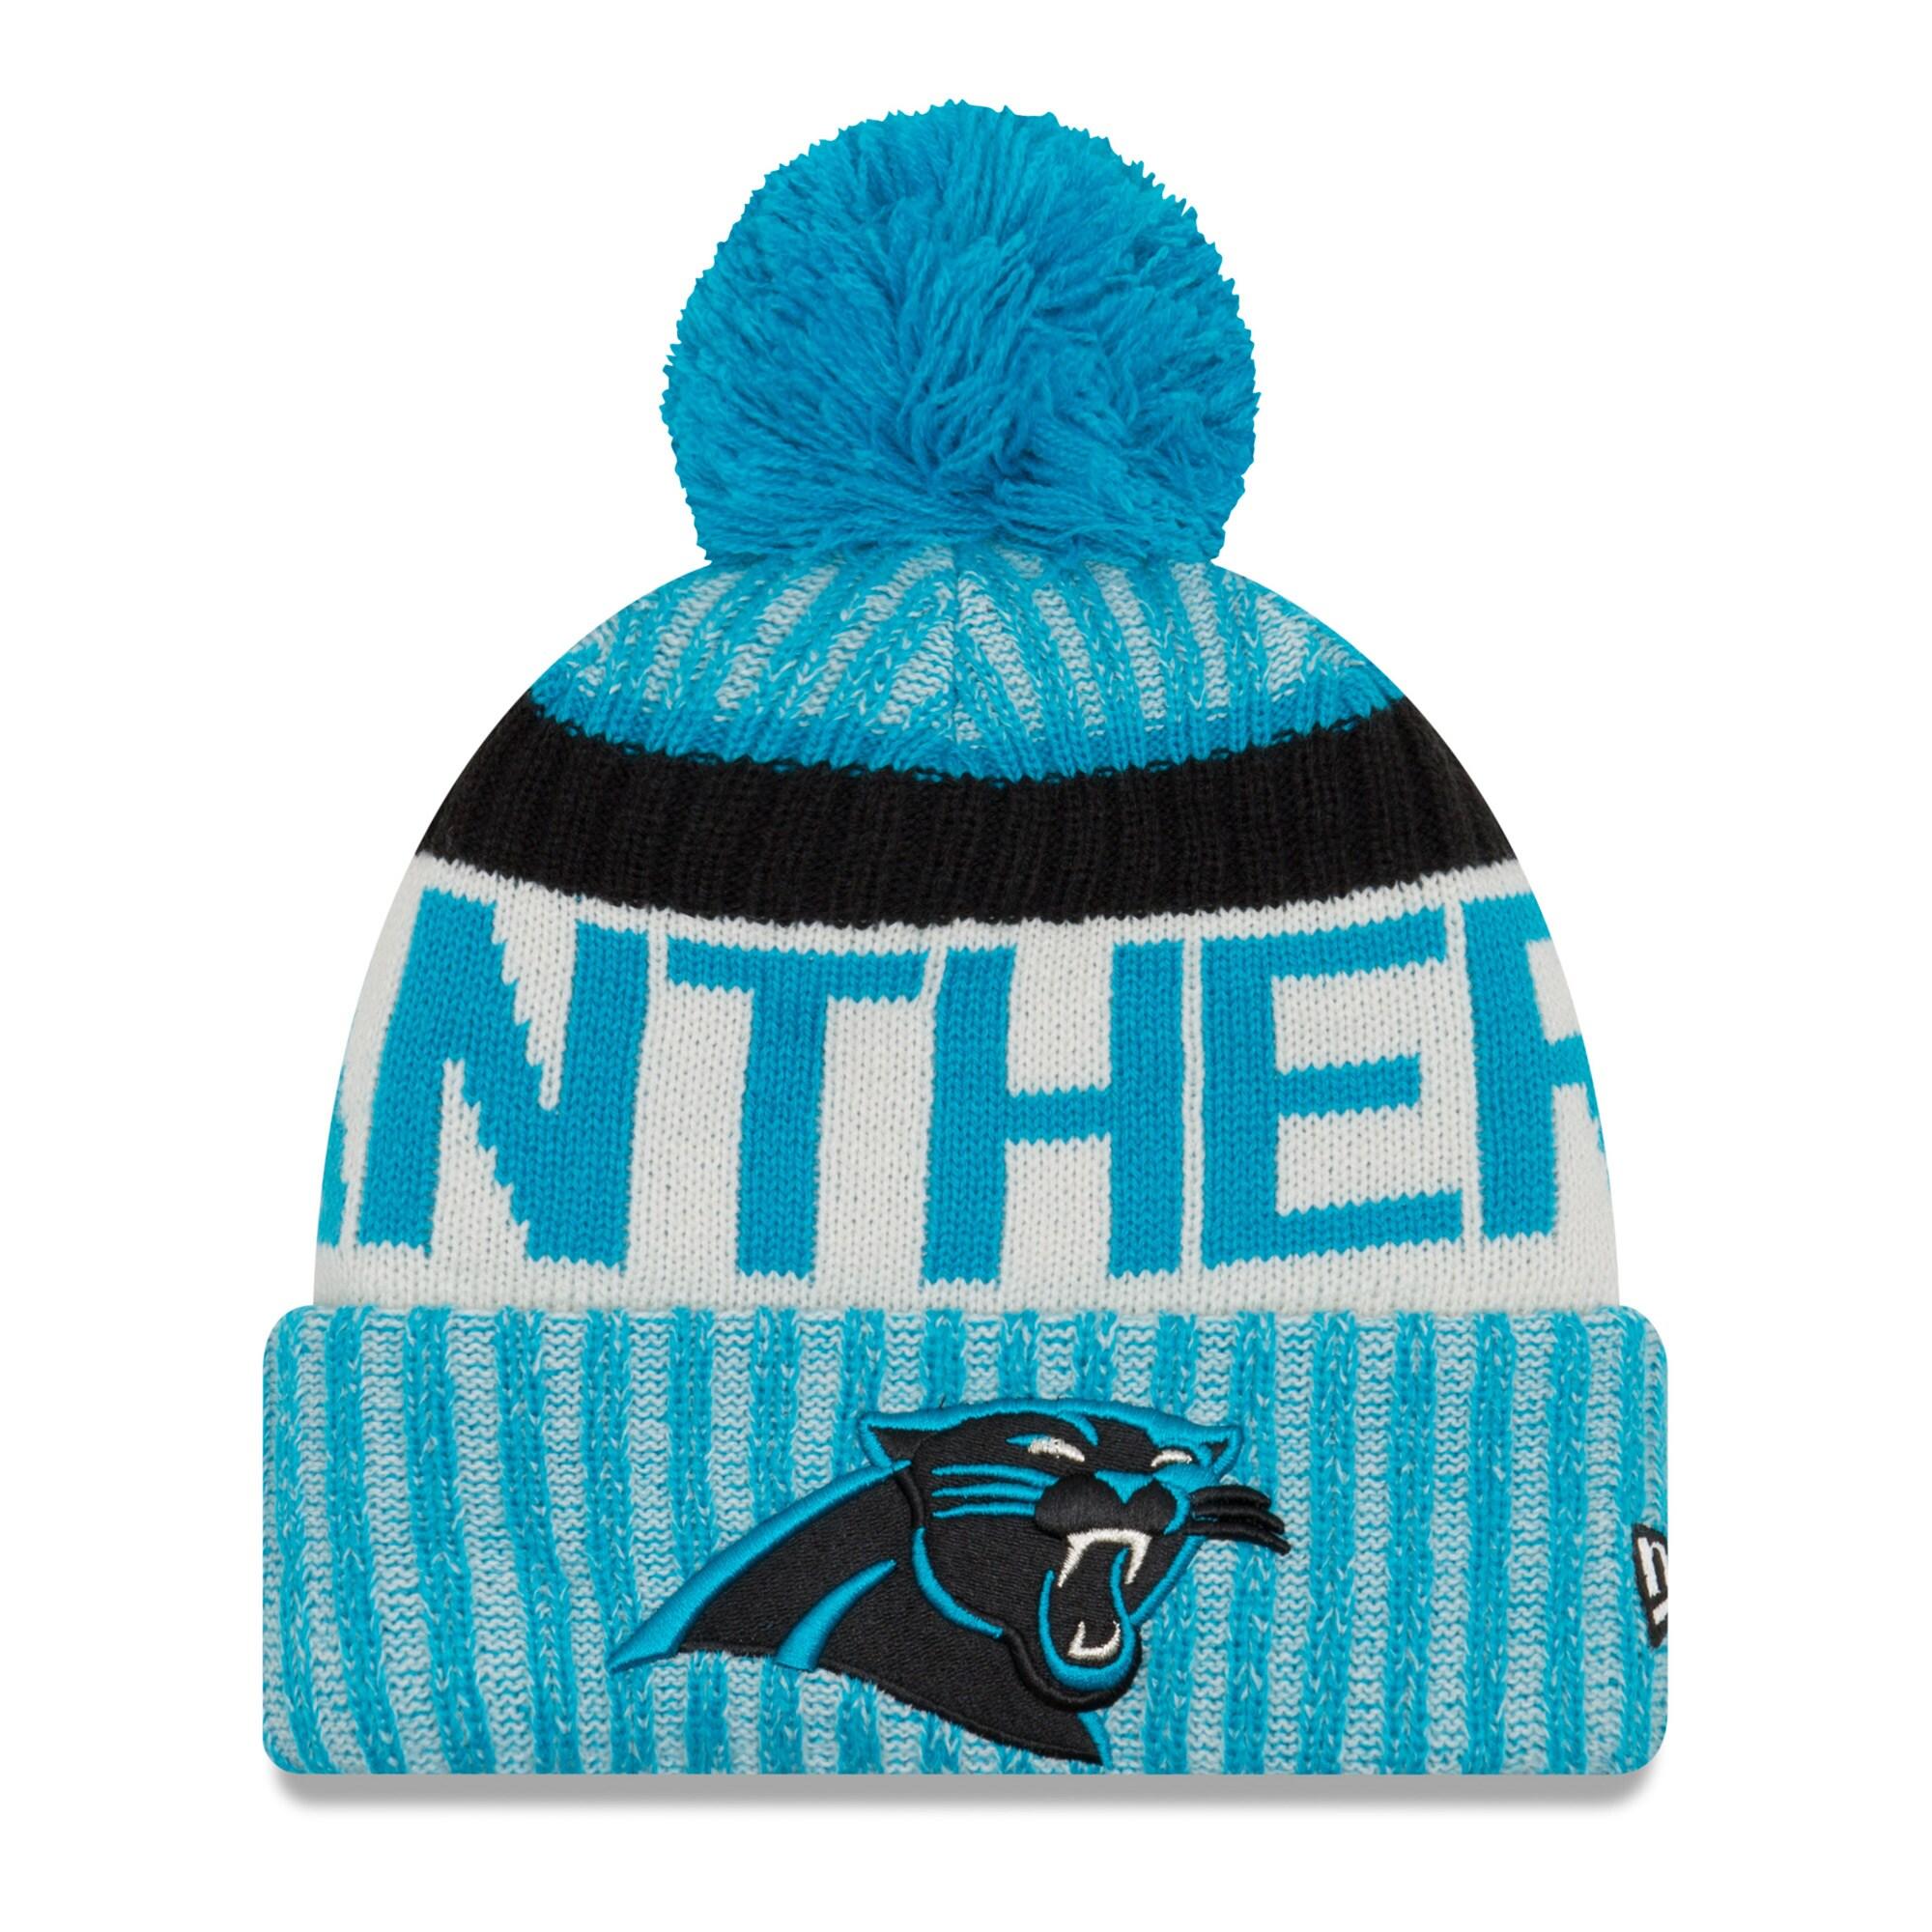 Carolina Panthers New Era Youth 2017 Sideline Official Sport Knit Hat - Blue